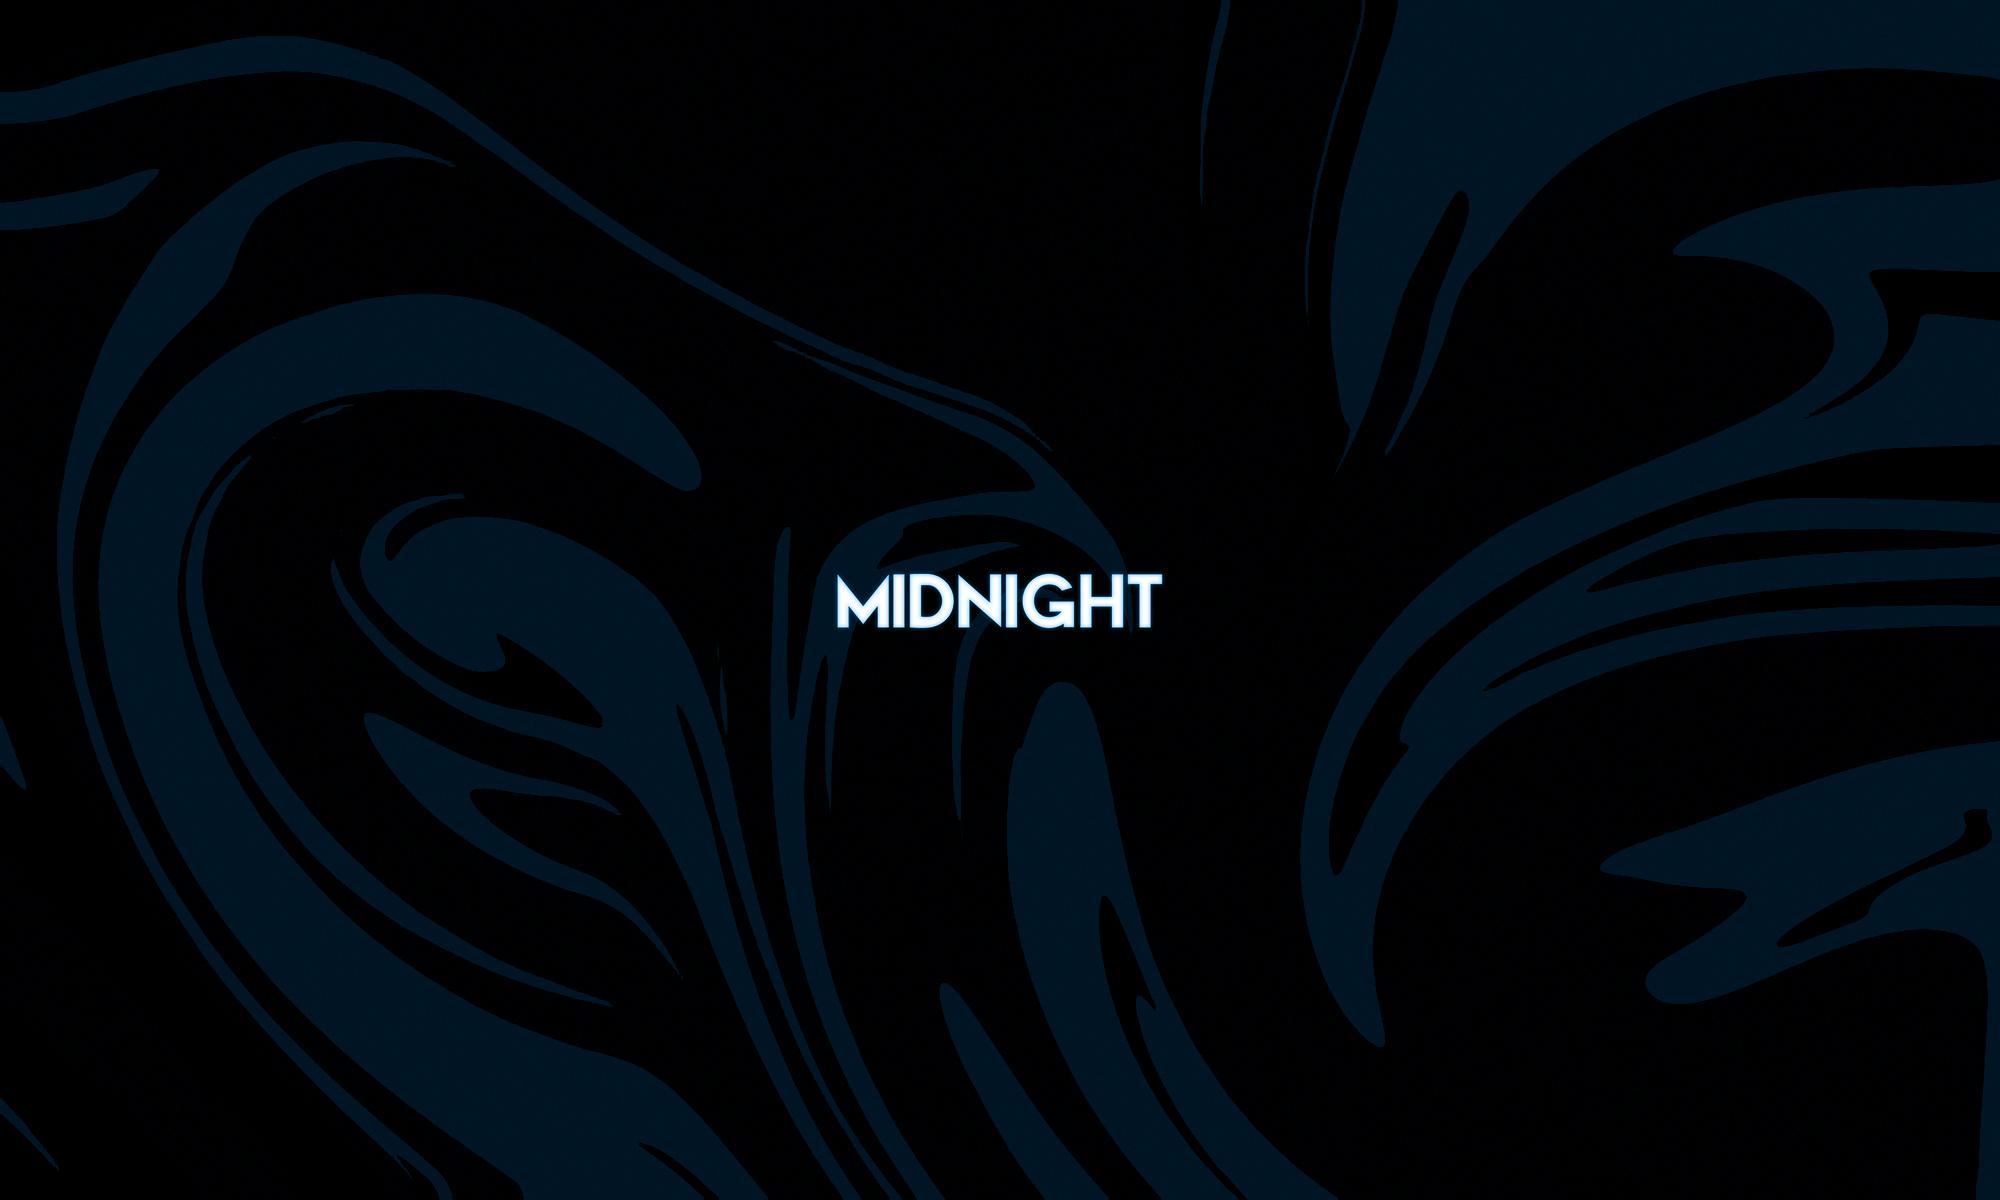 Midnight Sketch Theme